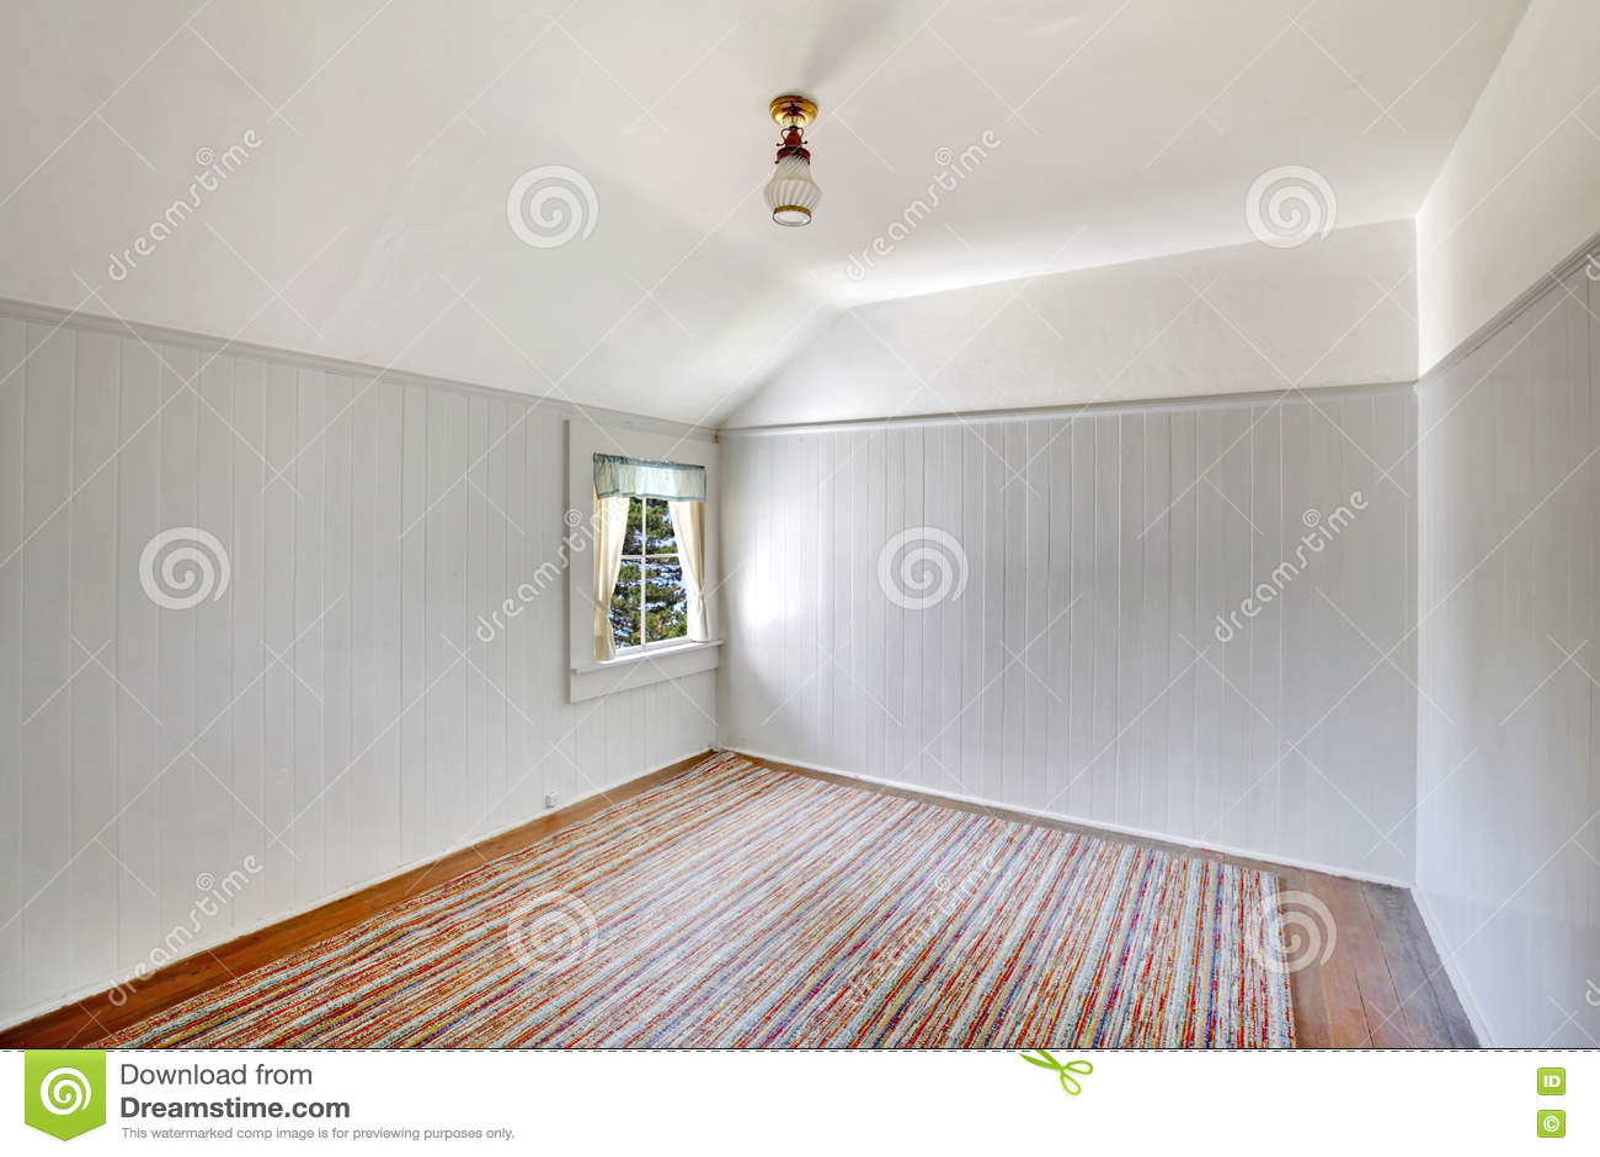 Trim Vaulted Ceilings